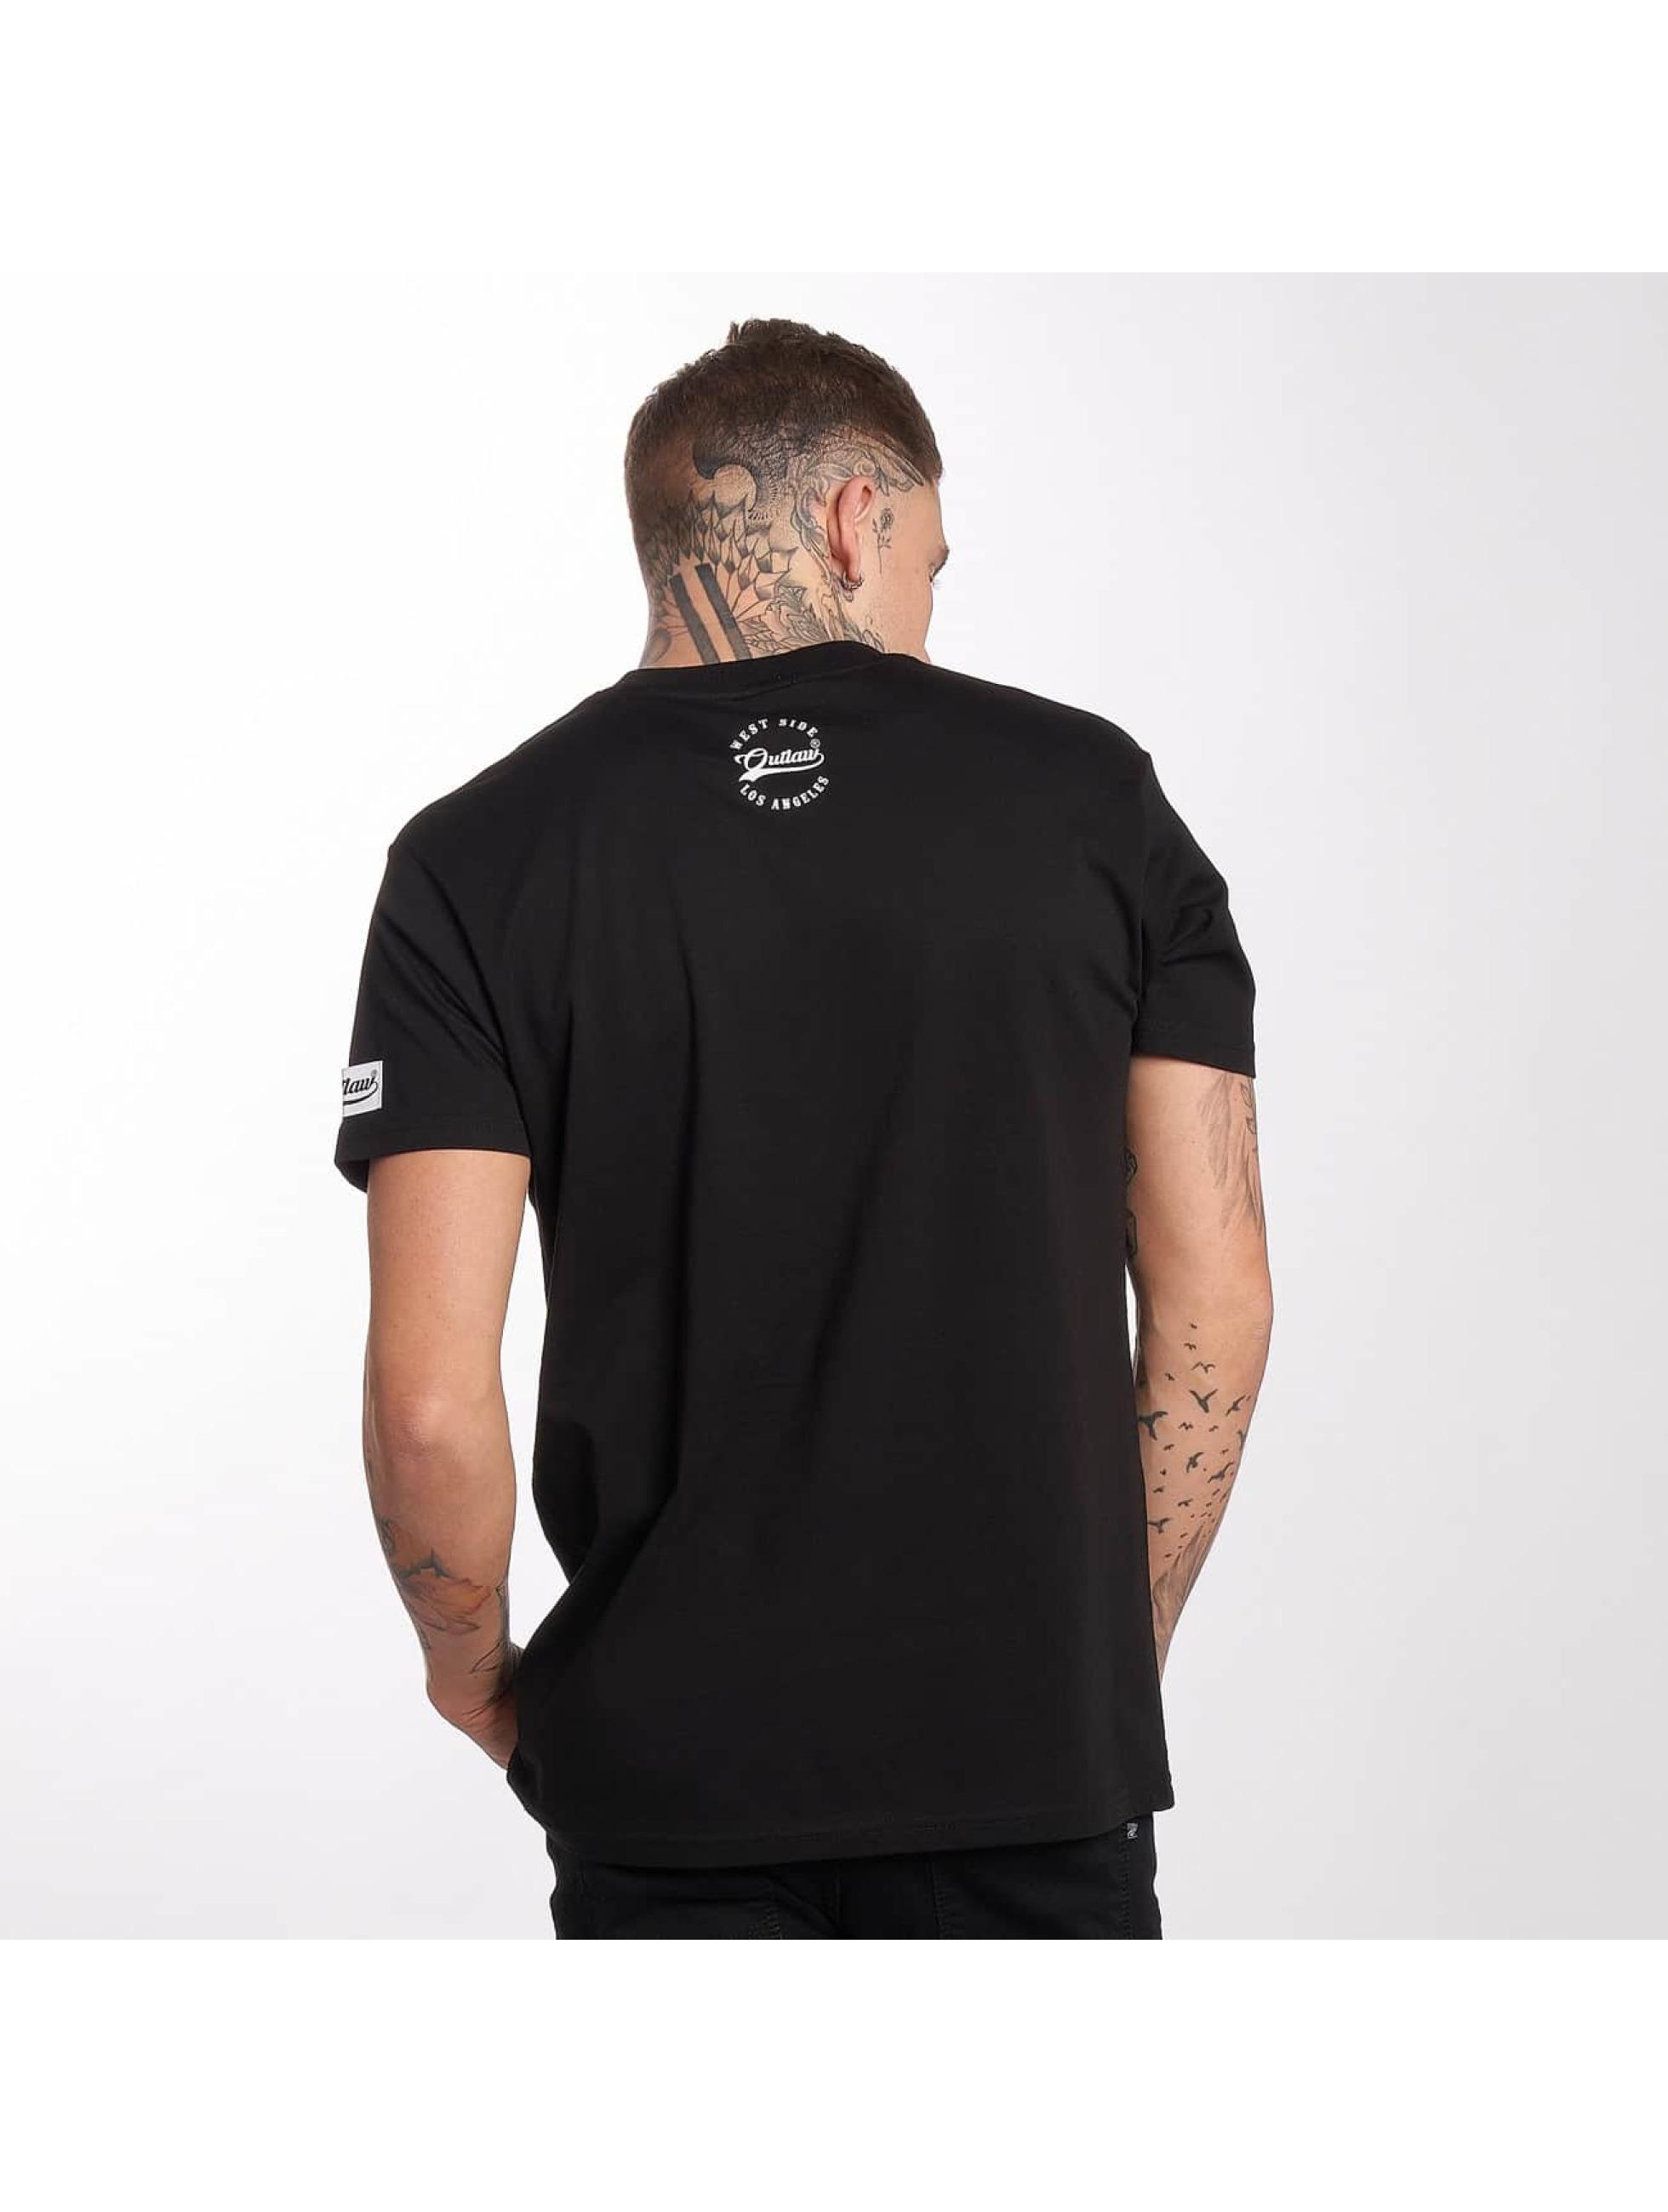 Outlaw t-shirt Me against the world zwart